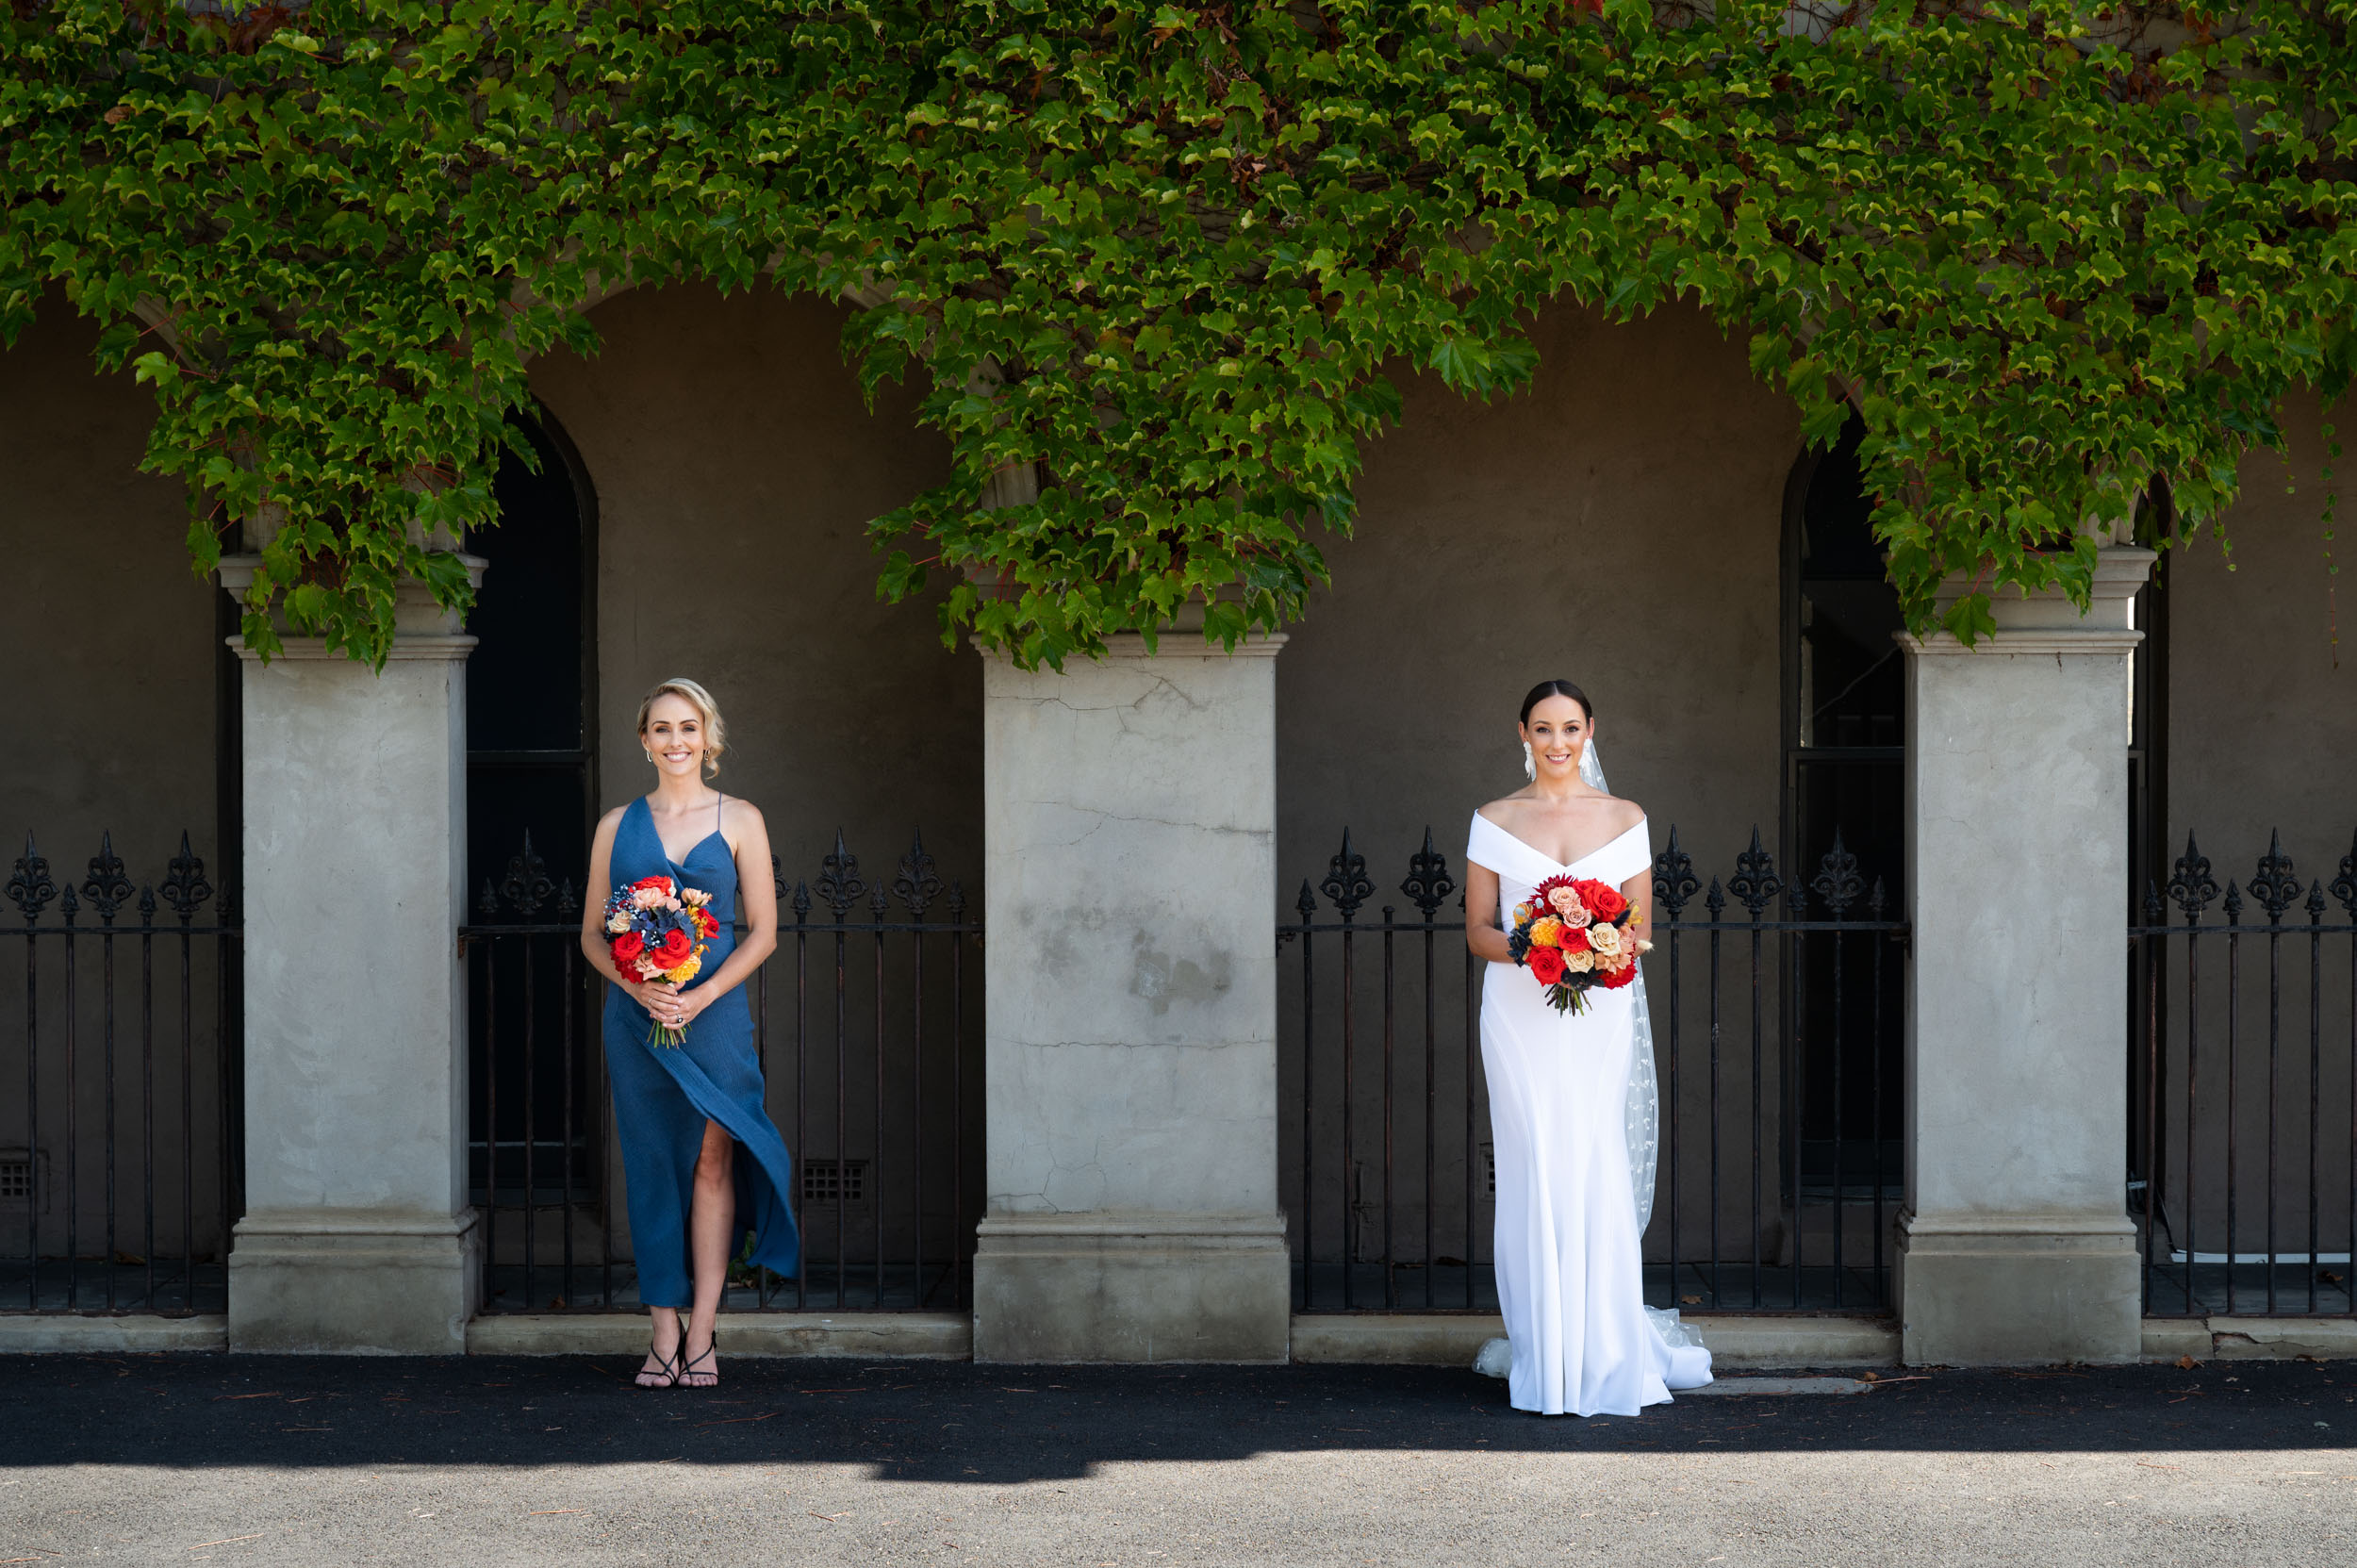 Wedding, Bride, Bridesmaid, Love Alfalfa Florals, Georgia Young Couture, Bouquet, Wedding Bouquet, Wedding Dress, Melbourne Wedding, Brad Geddes Photography